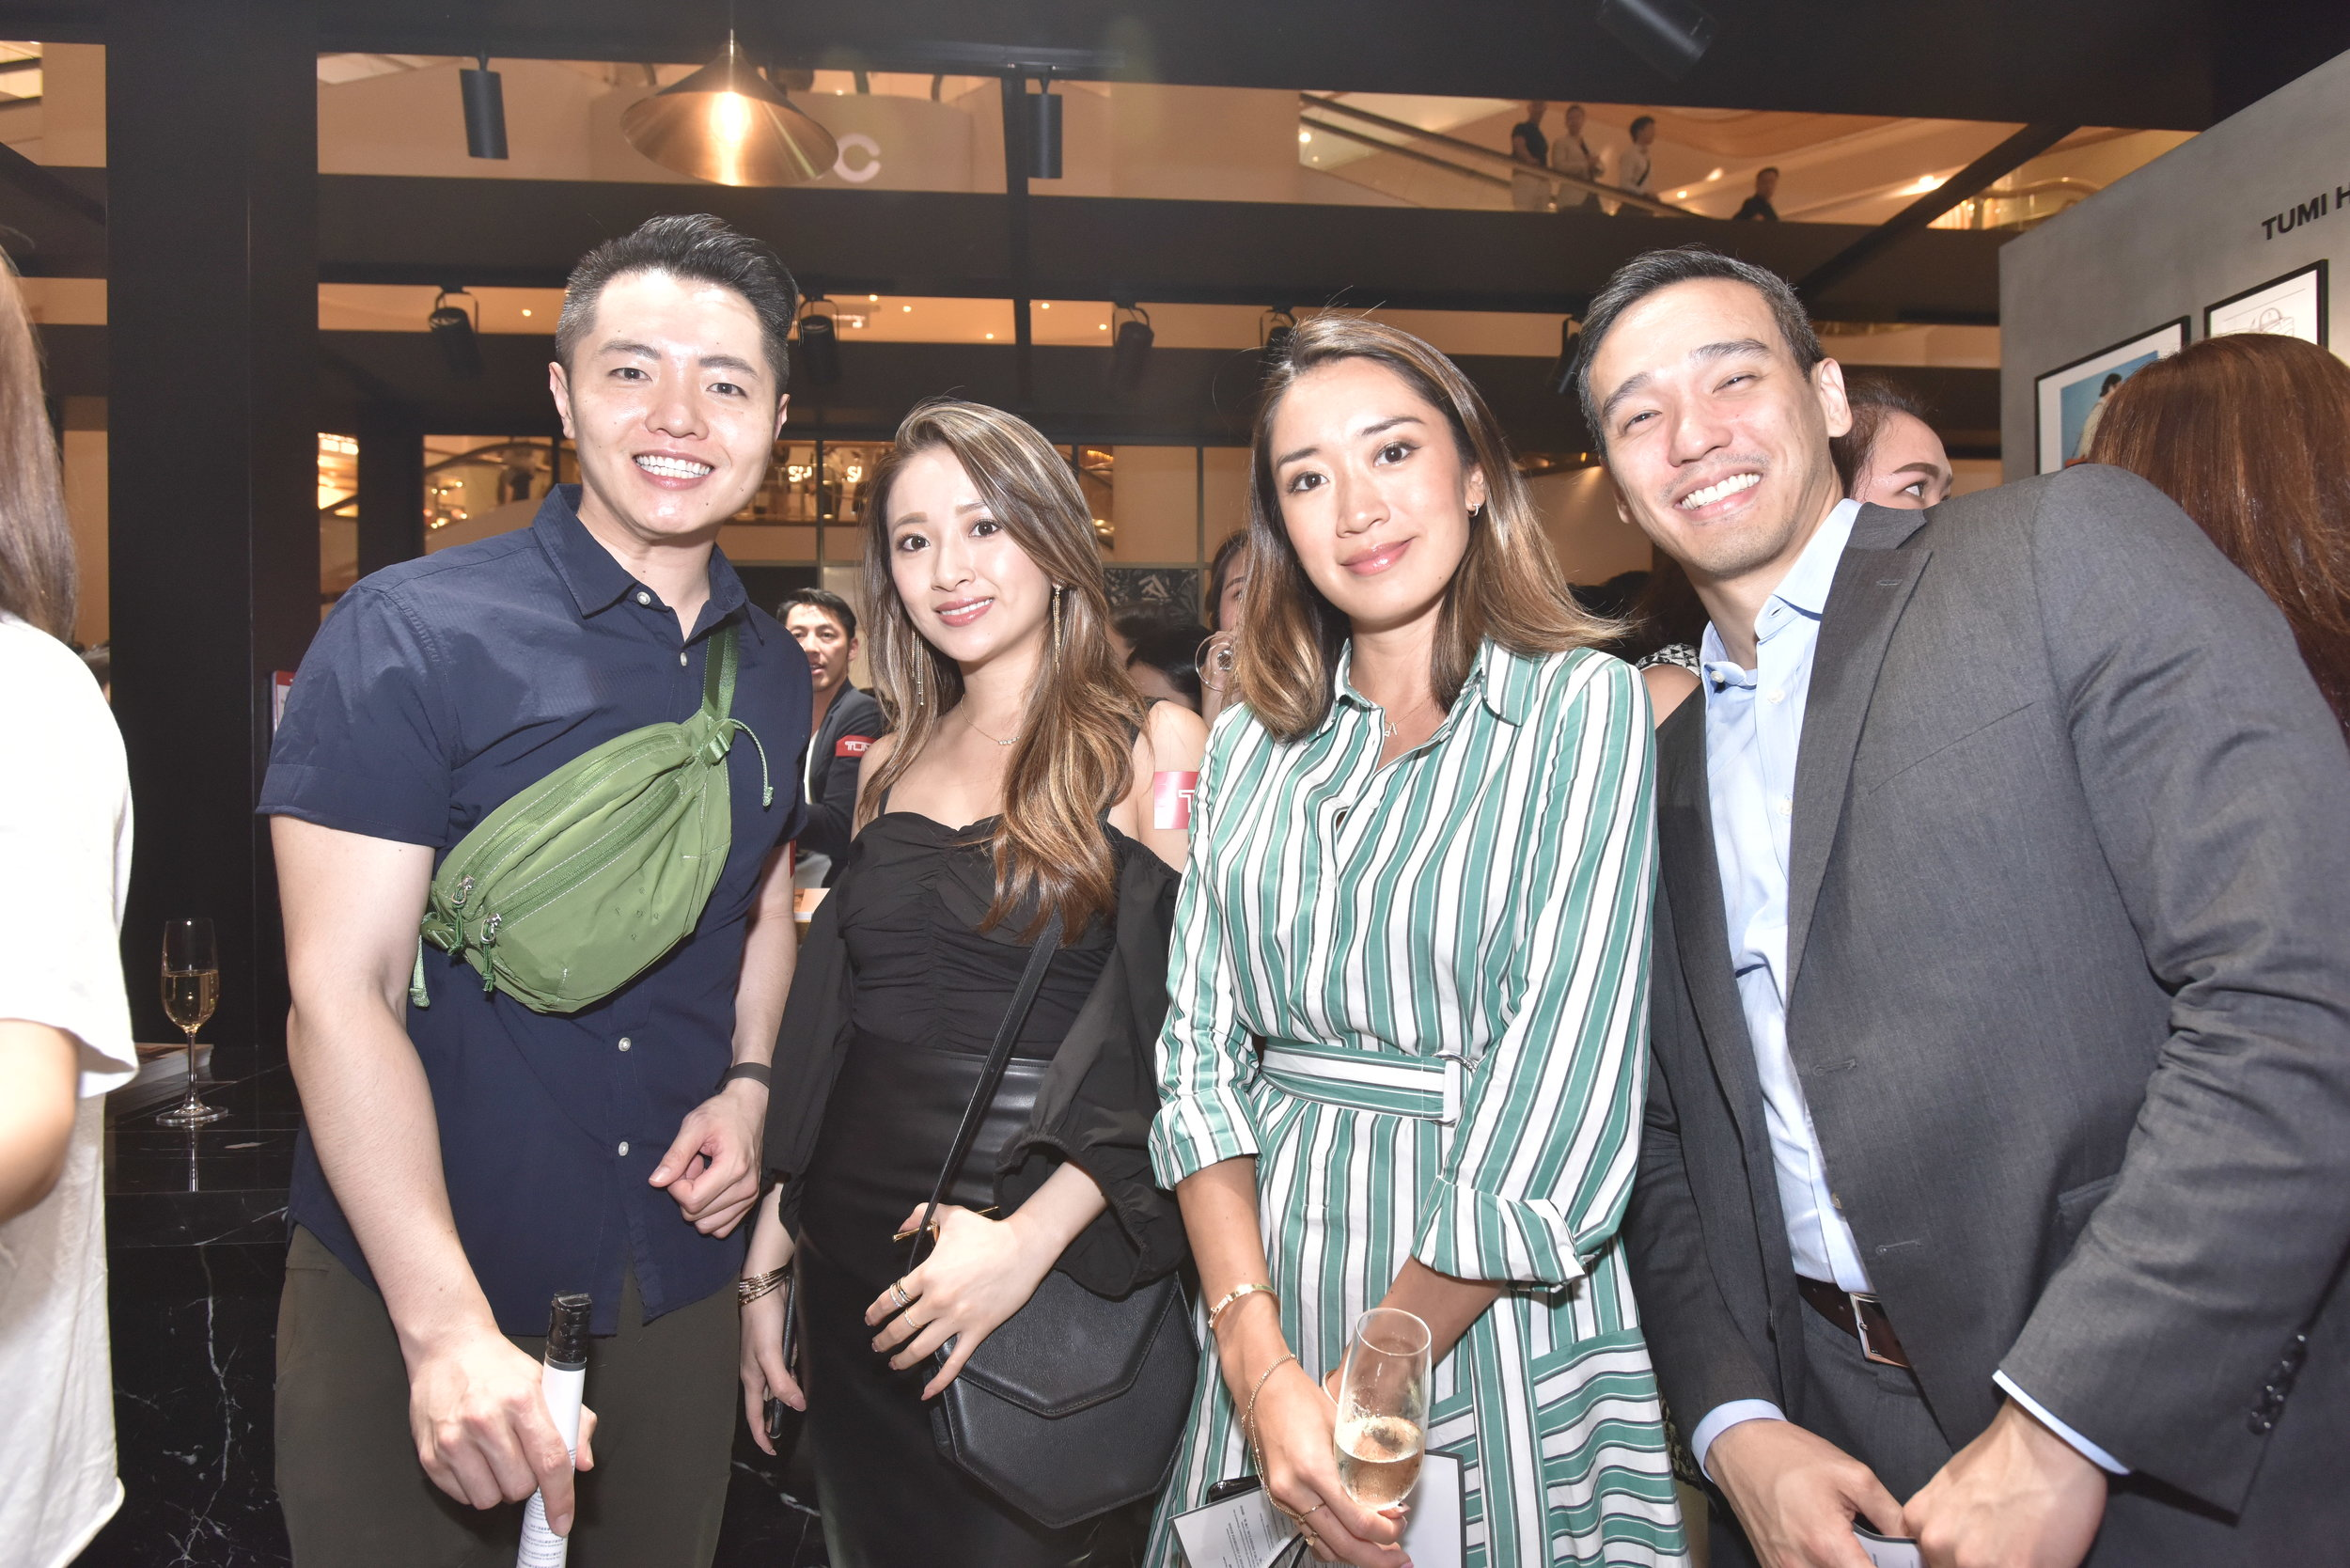 DSC_8691_Antonia Da Cruz + Sarah Zhuang.JPG